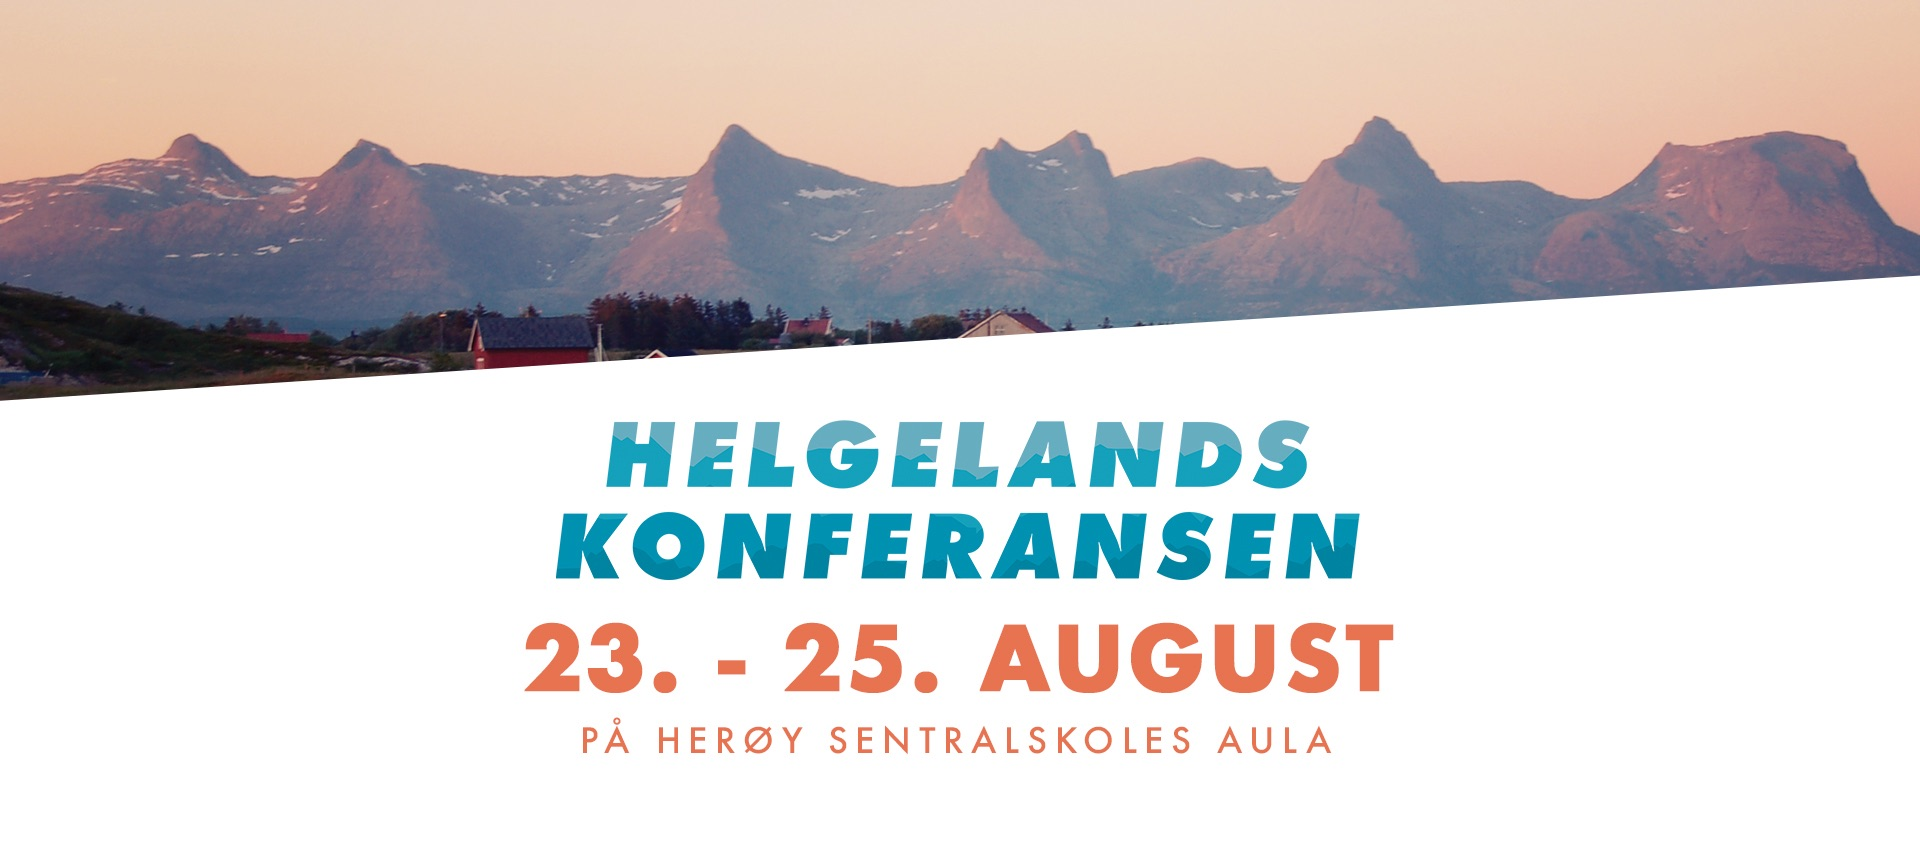 Helgelandskonferansen 2019